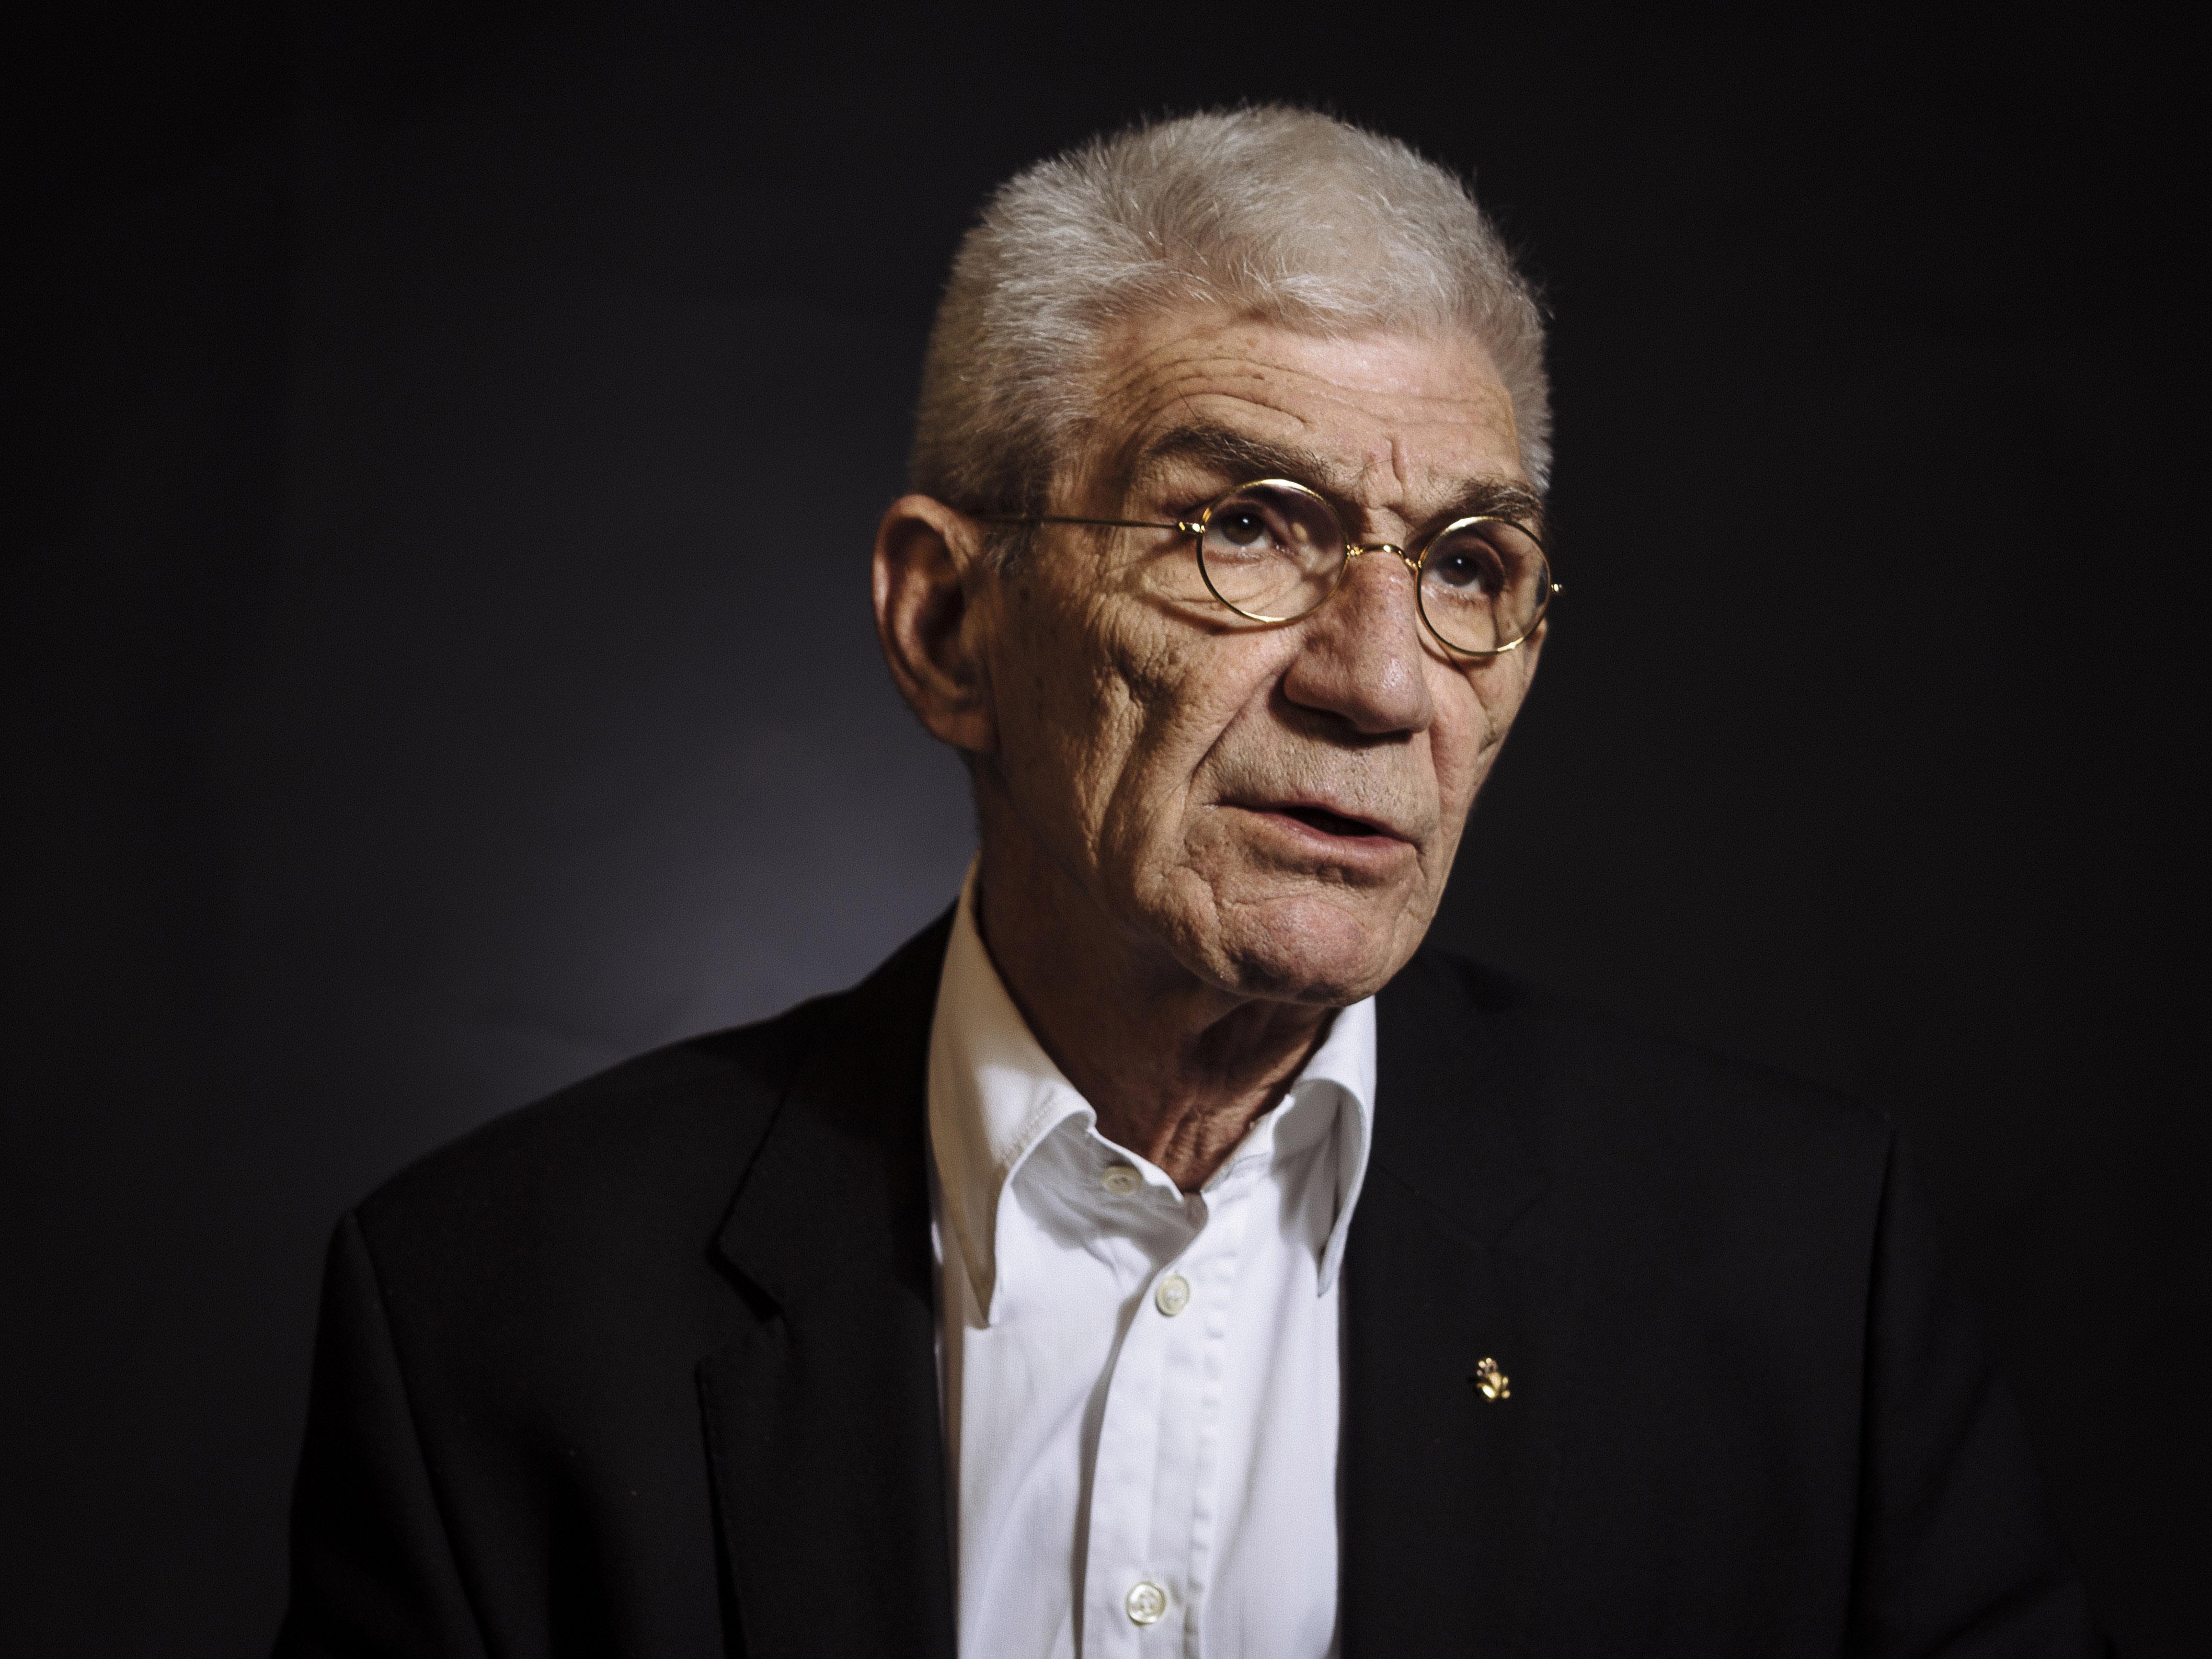 IBNA/Interview: Yiannis Boutaris, Mayor of Thessaloniki